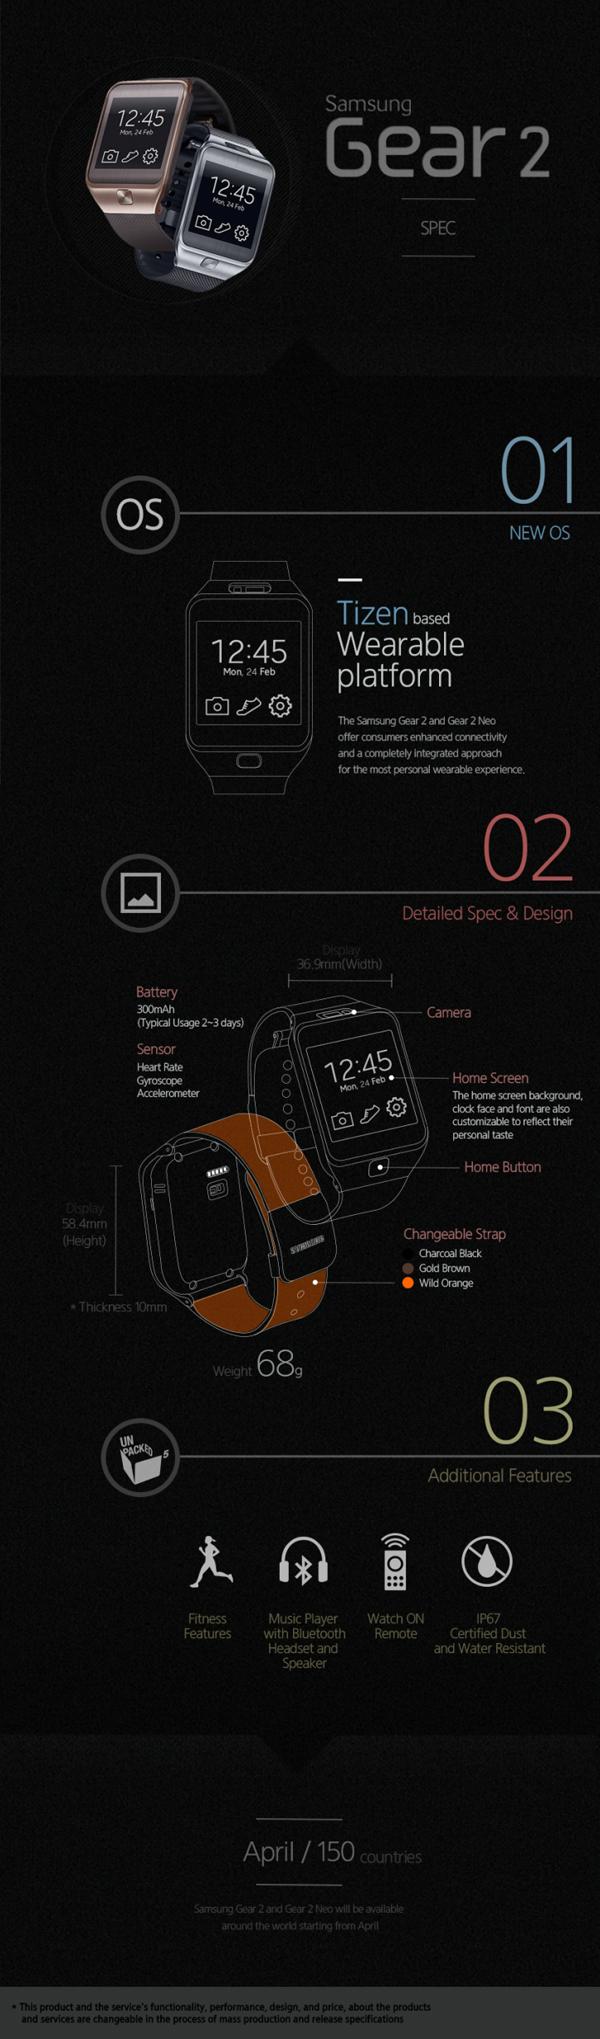 Samsung Galaxy Gear 2 infographic